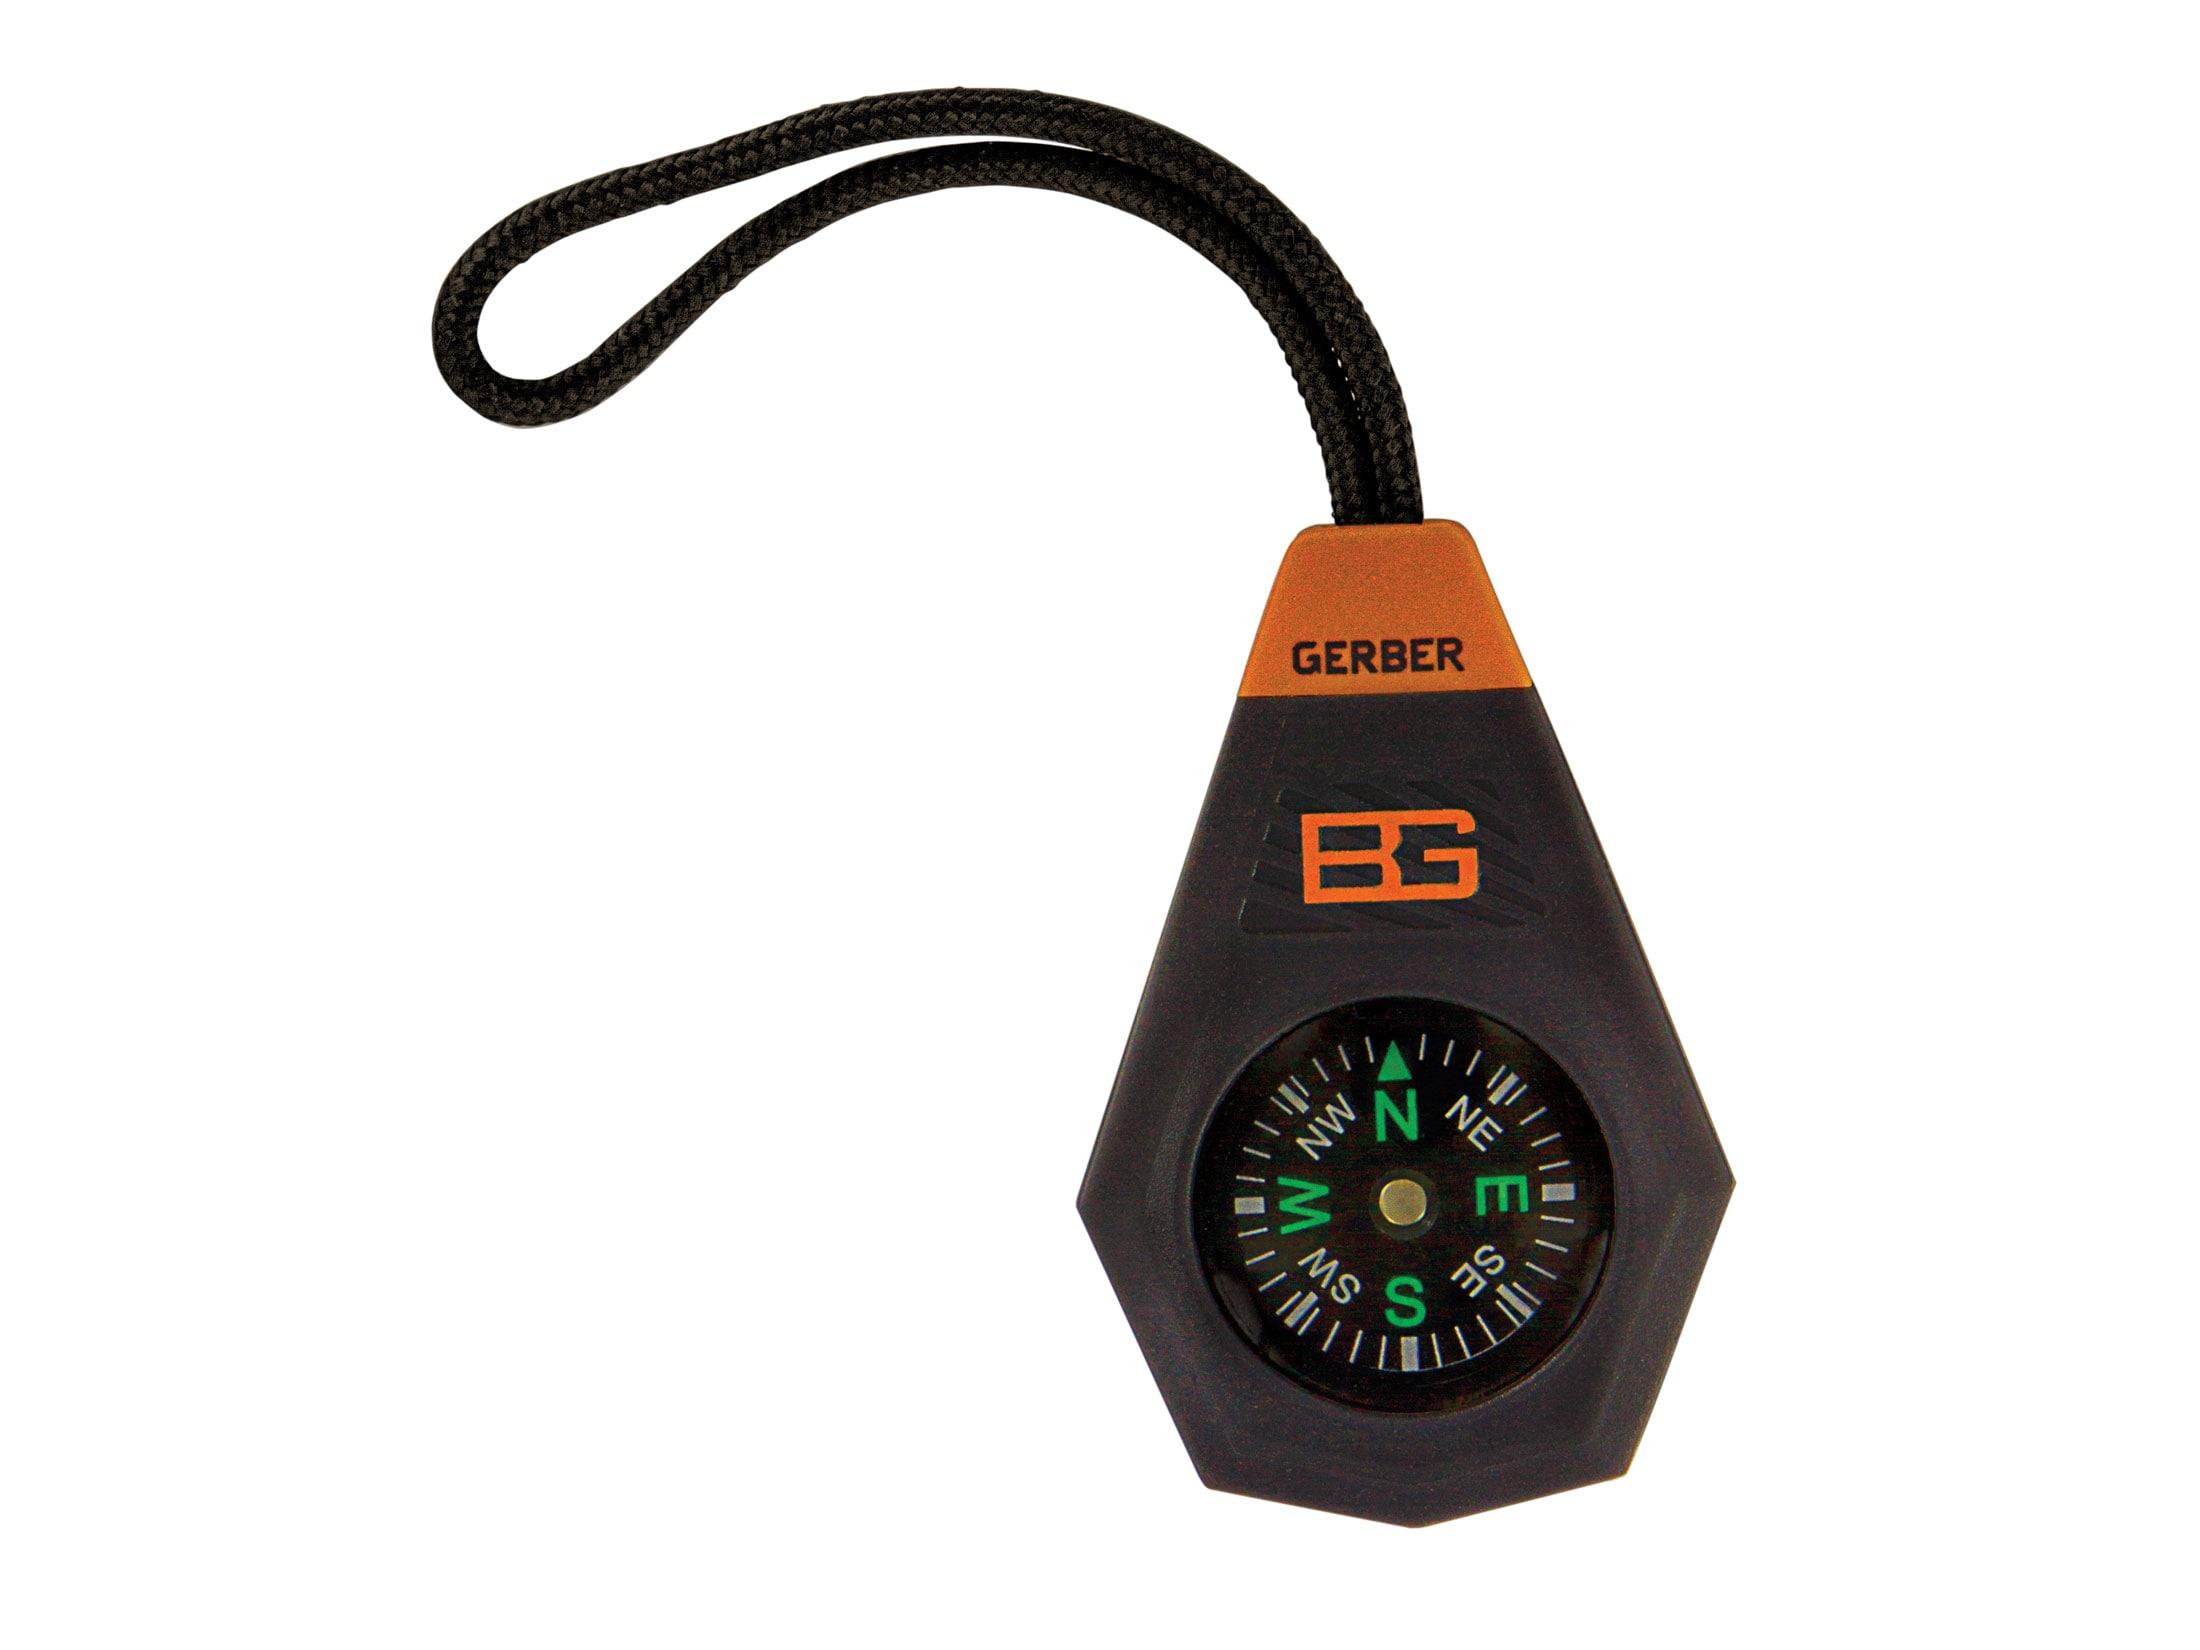 Bear Grylls Gerber Survival Compact Compass keyring